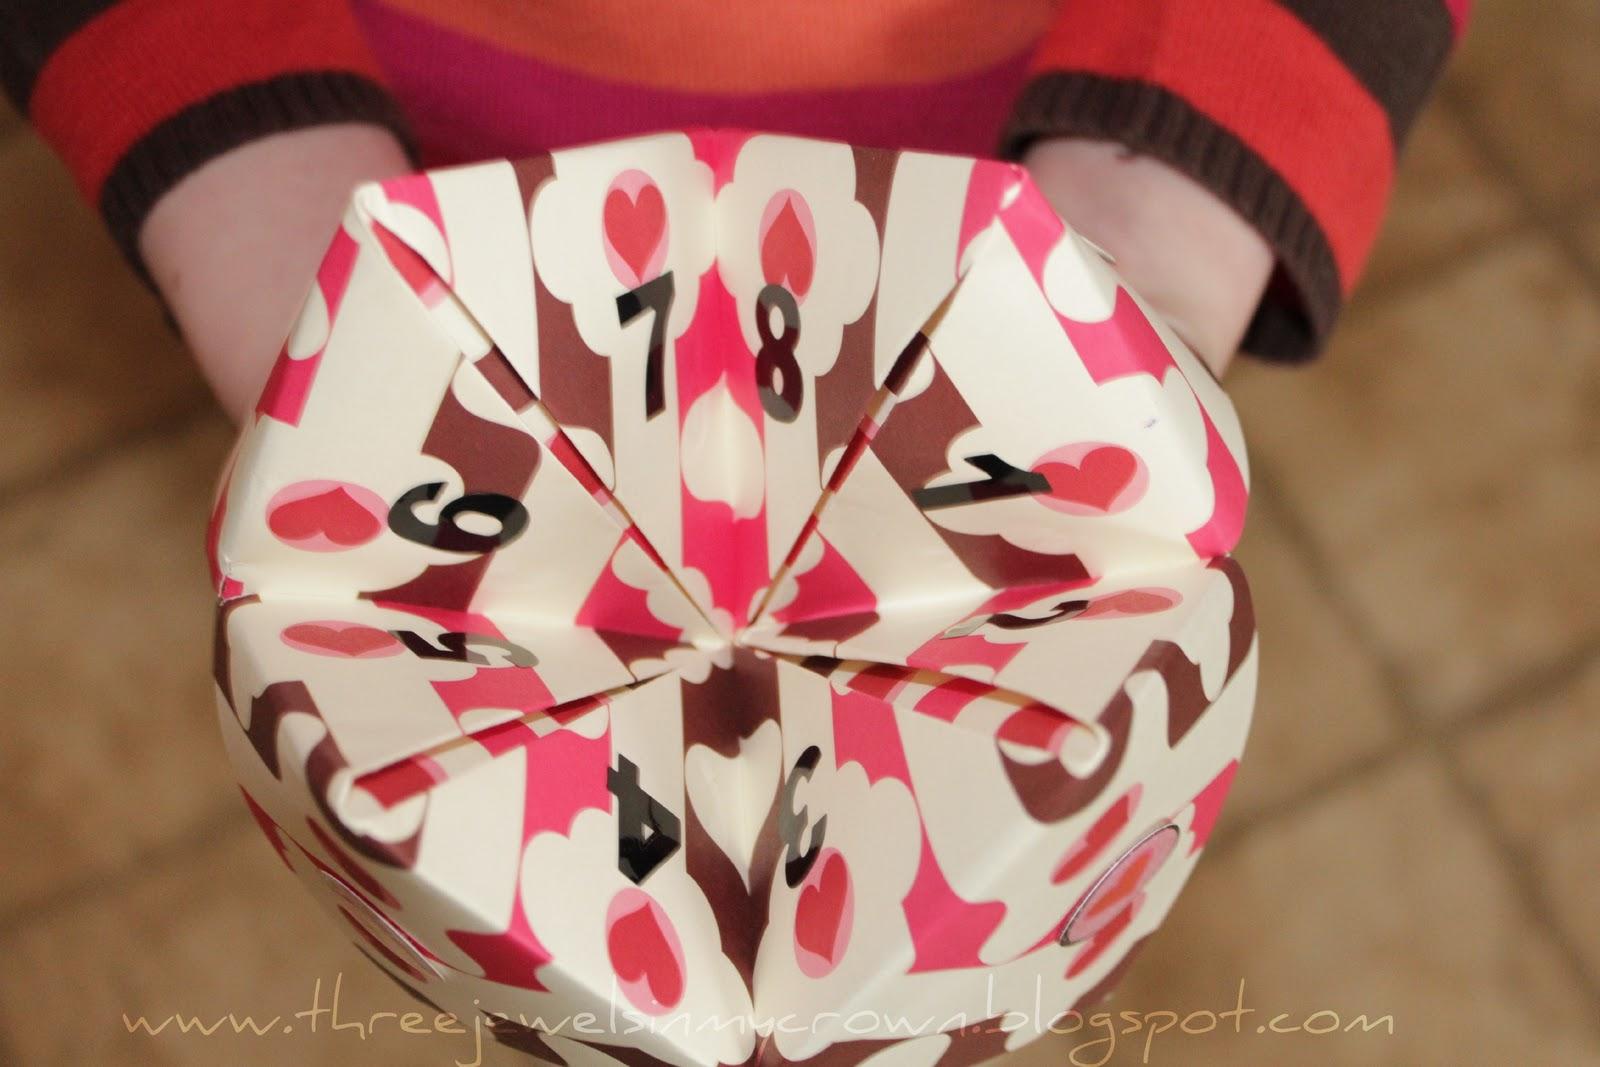 nageldesign mandelform - Pink Venus Mandelform Nailart Video Nr 58 by German